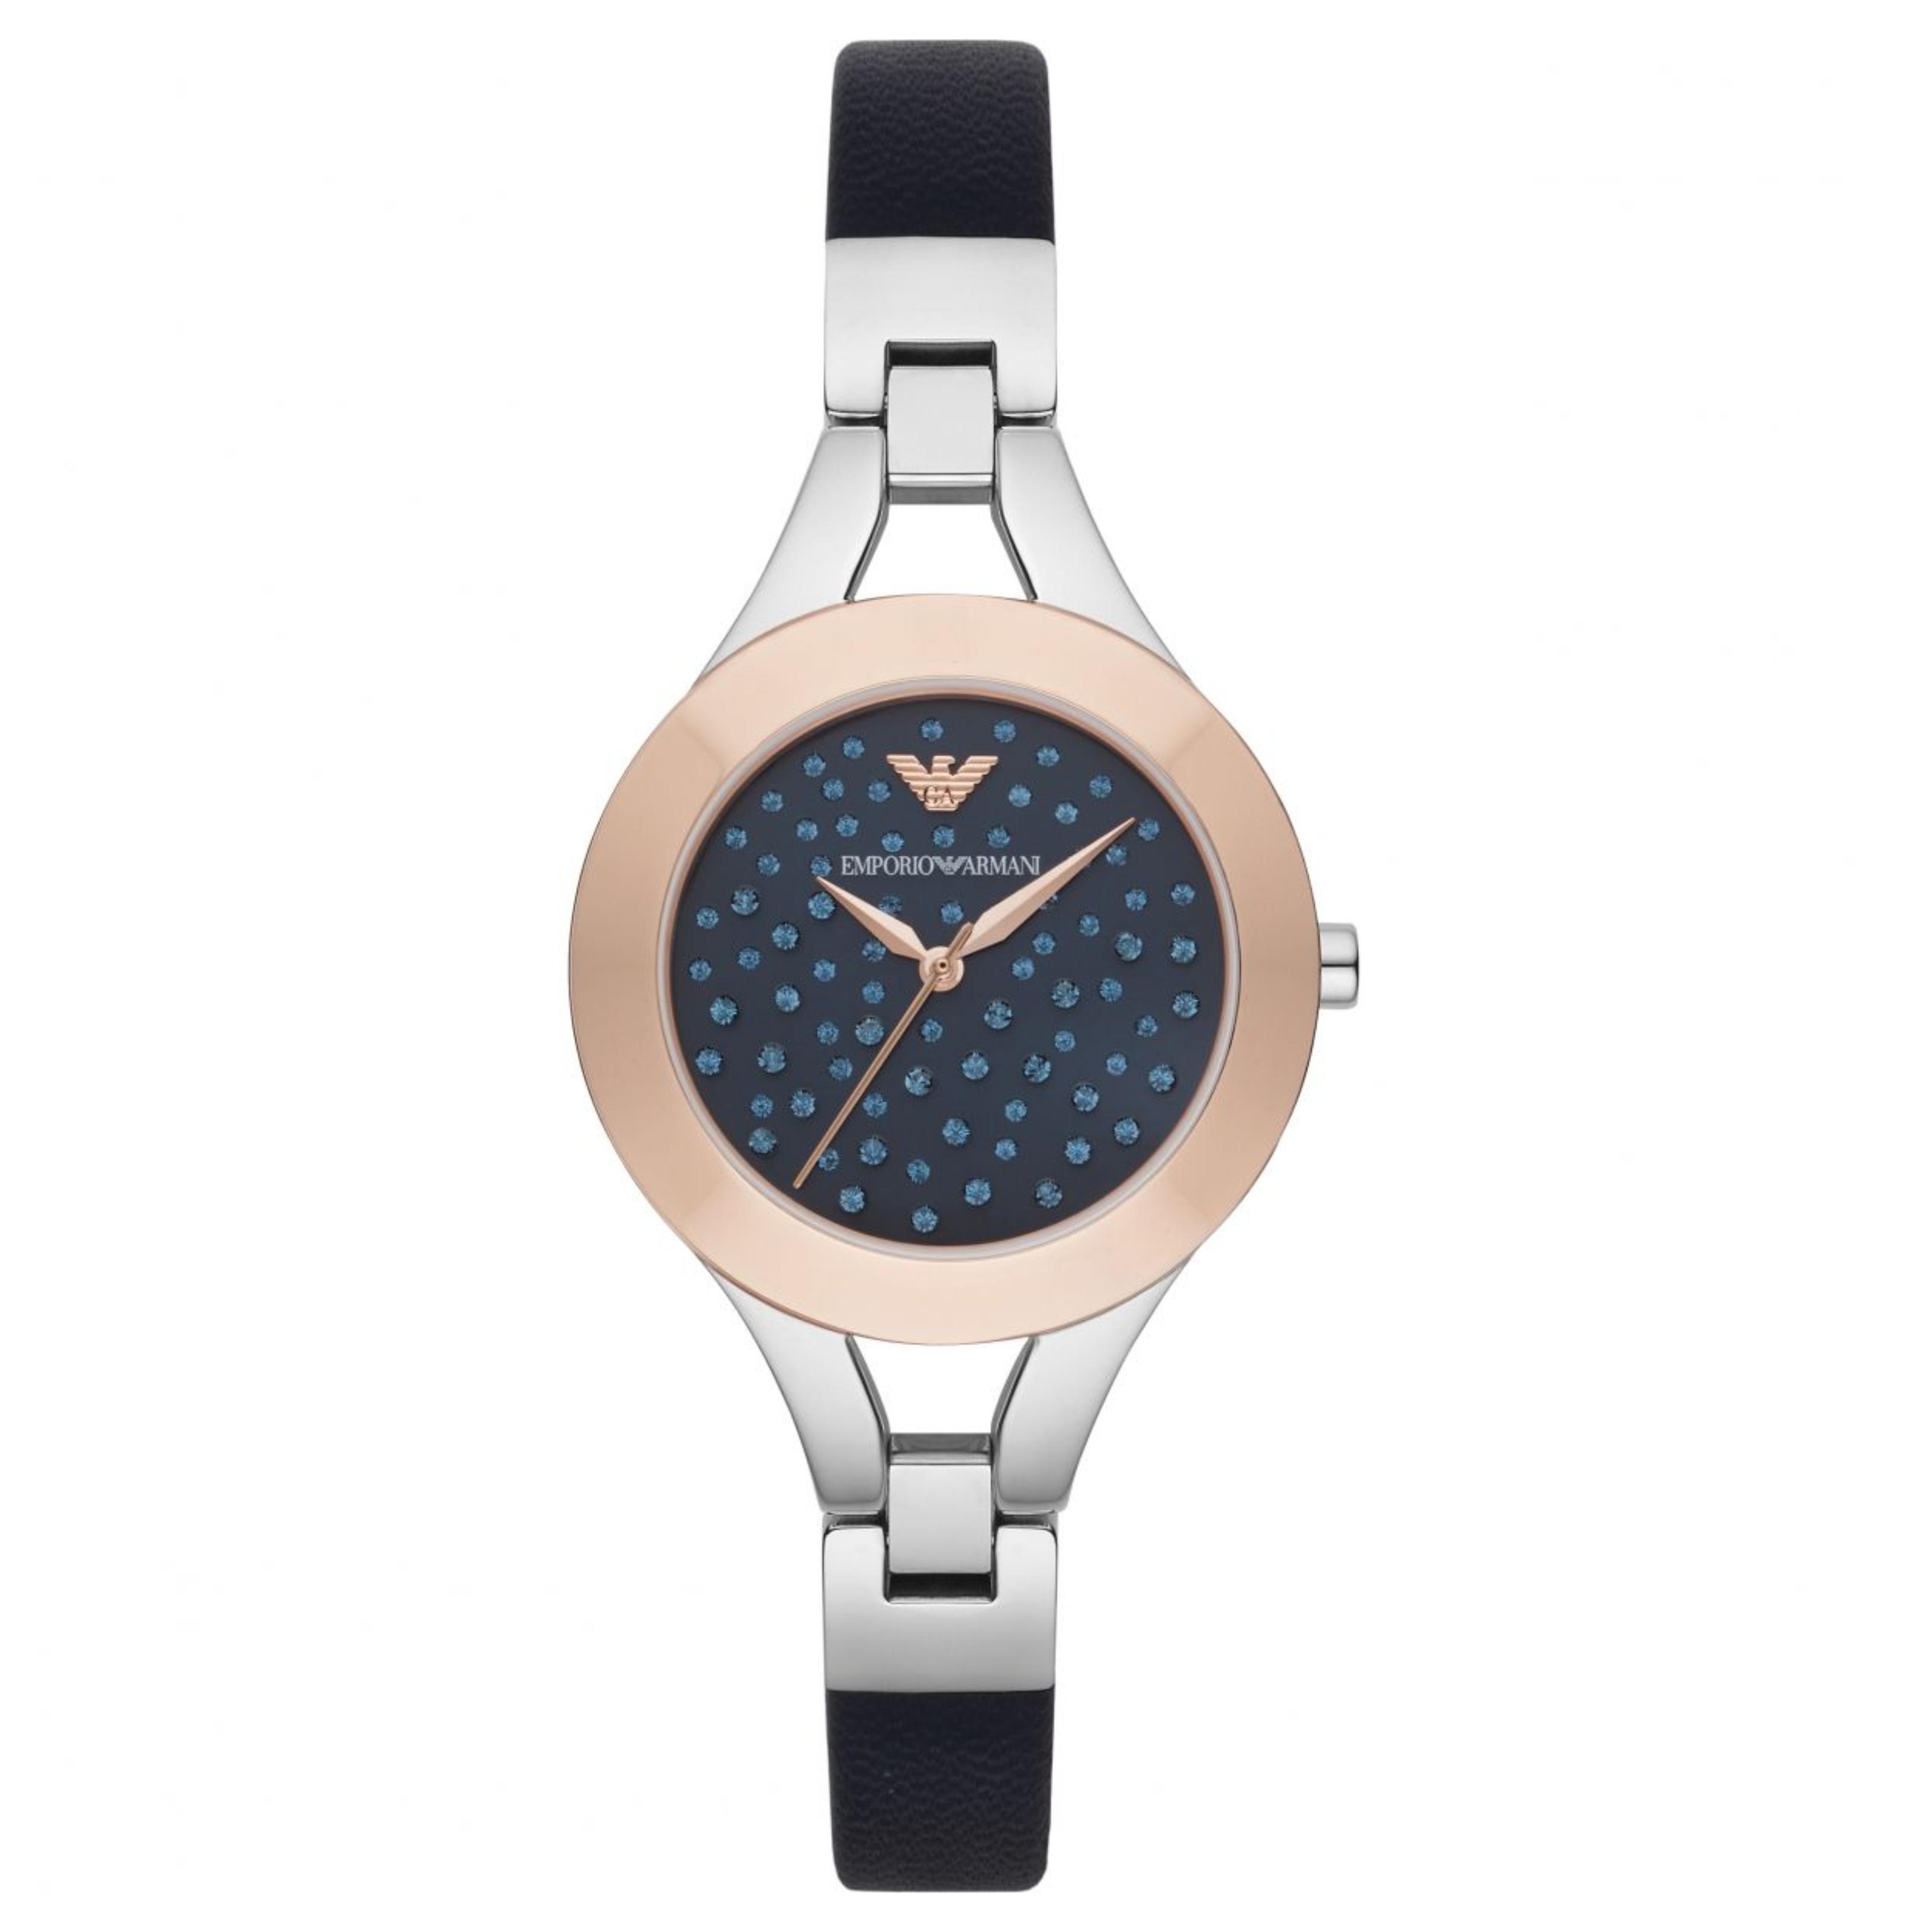 955abf45 Emporio Armani Chiara Ladies Watch AR7436   Crystal Pave Dial   Blue  Leather Strap